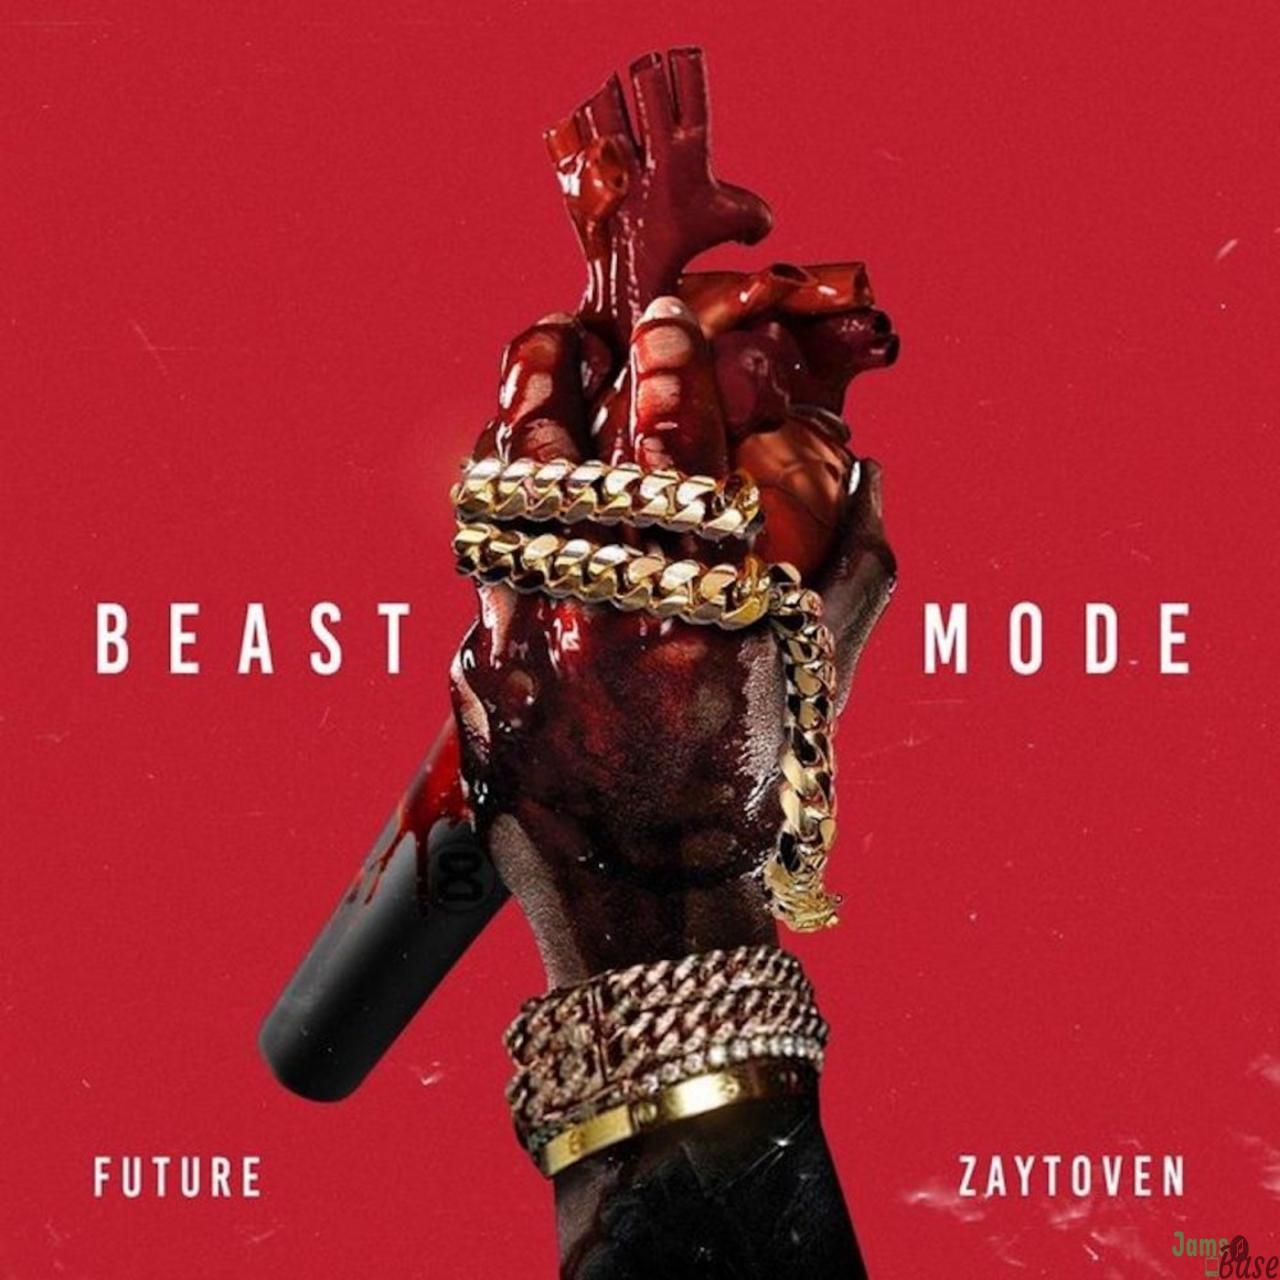 Future – Beast Mode